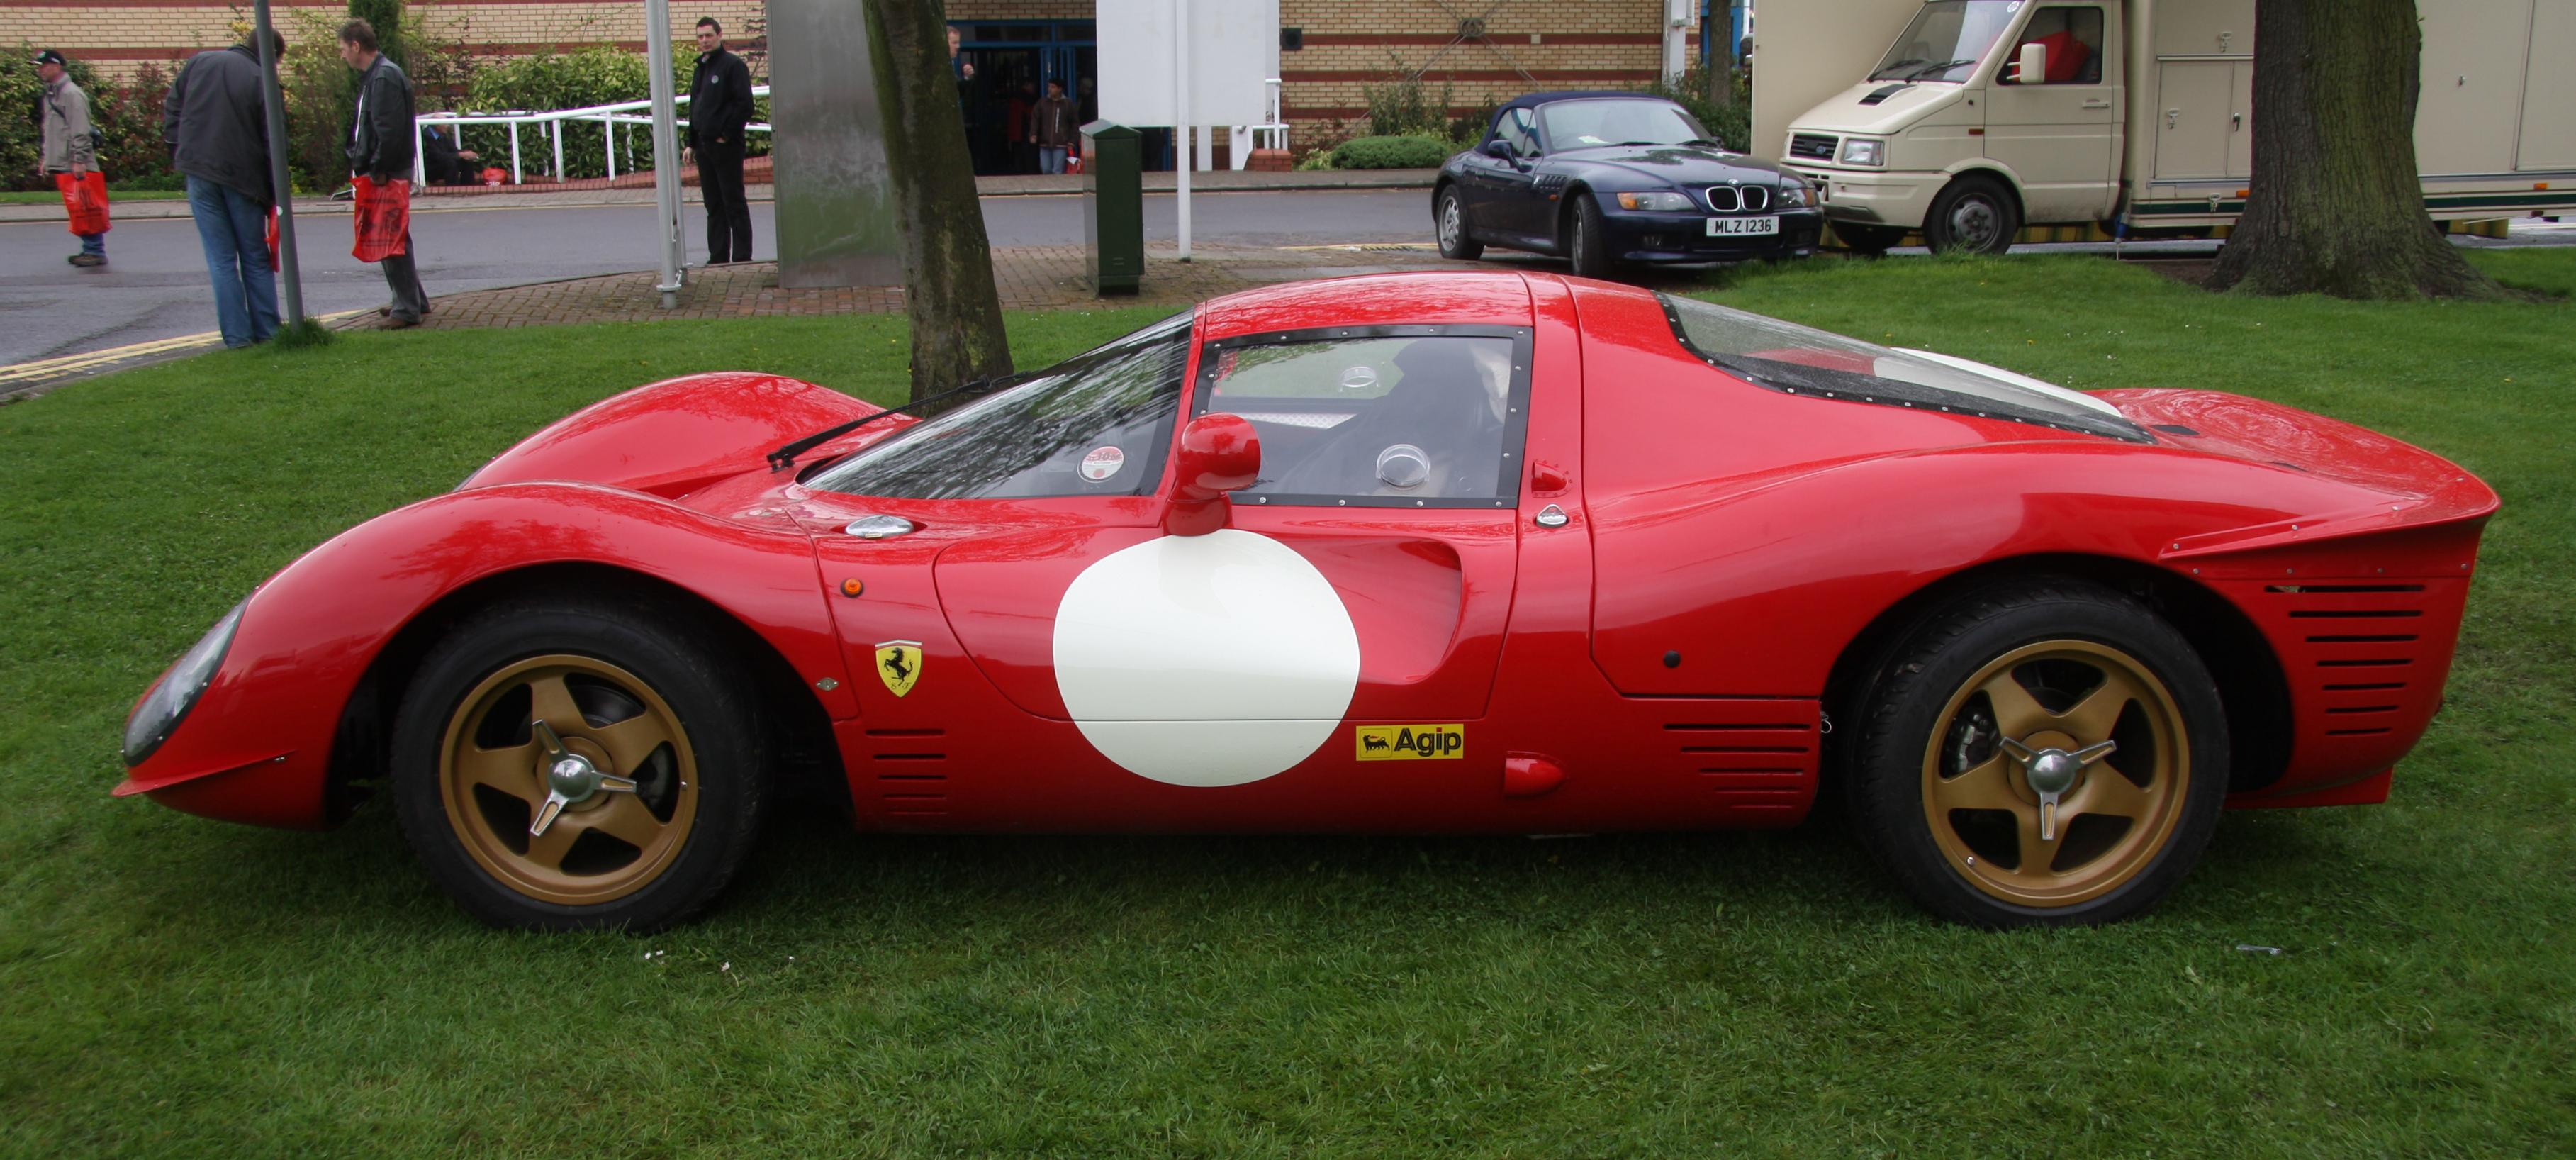 Race Car Replicas Adaptor Plate Cost